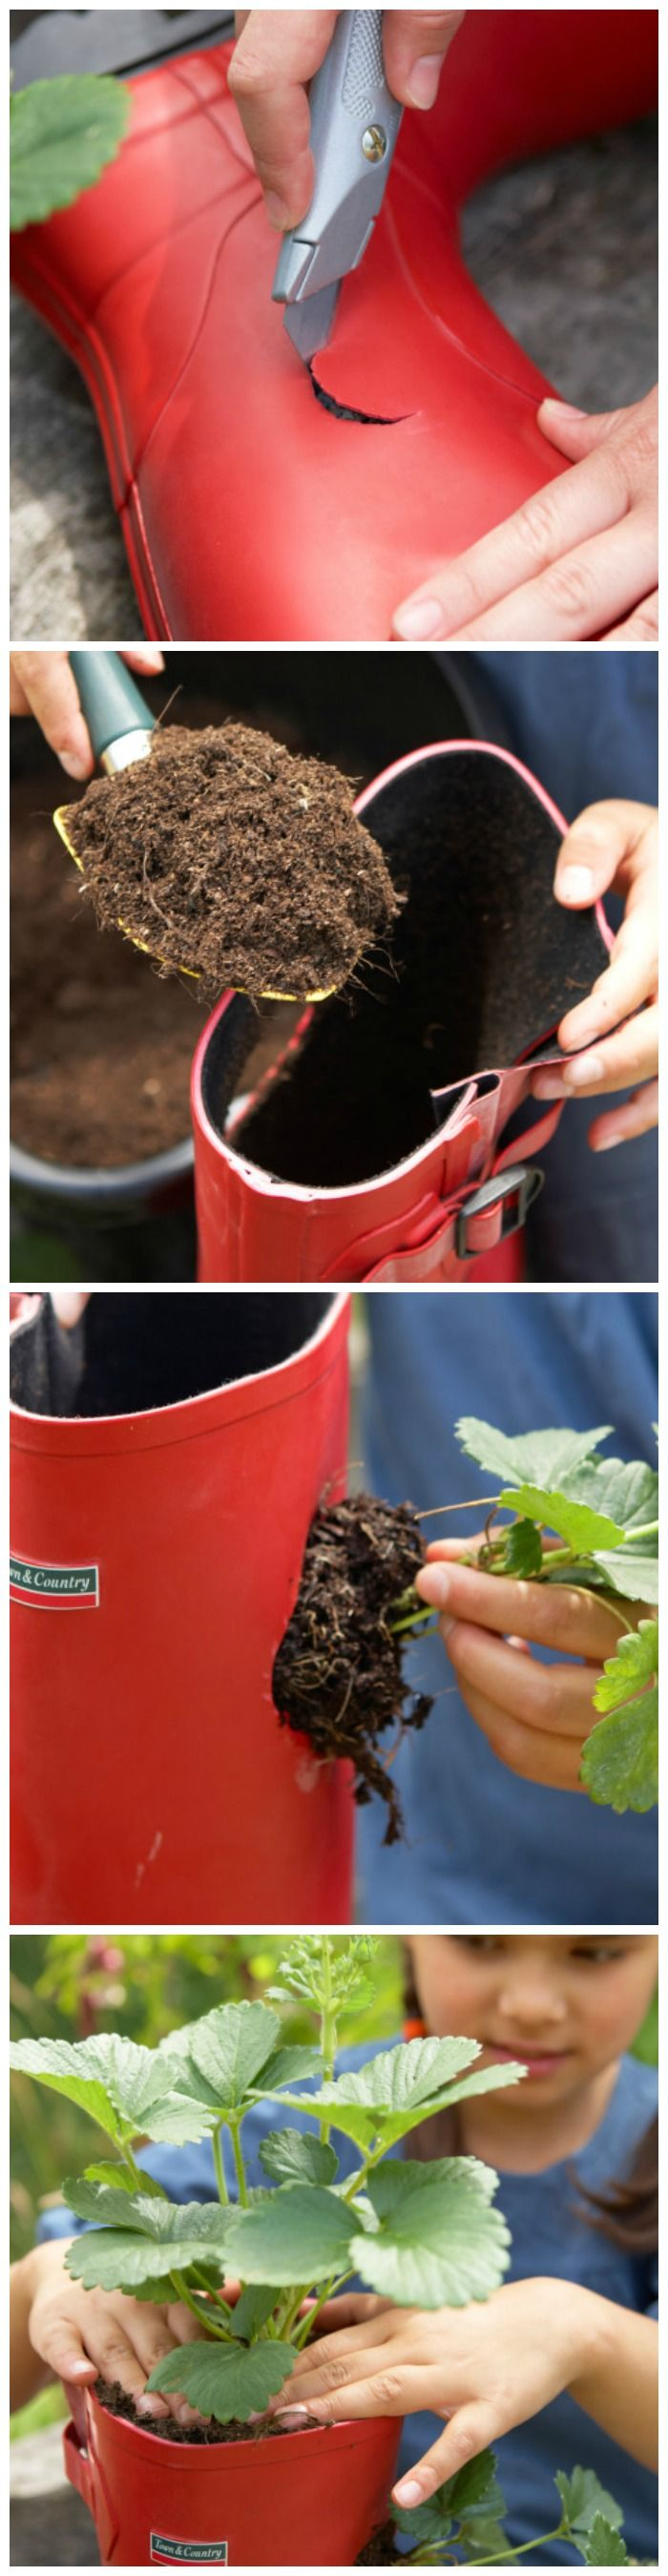 Fun Family Gardening Project: DIY Strawberry Rain Boot Planter --> http://www.hgtvgardens.com/family-gardening/diy-strawberry-planter?soc=pinterest